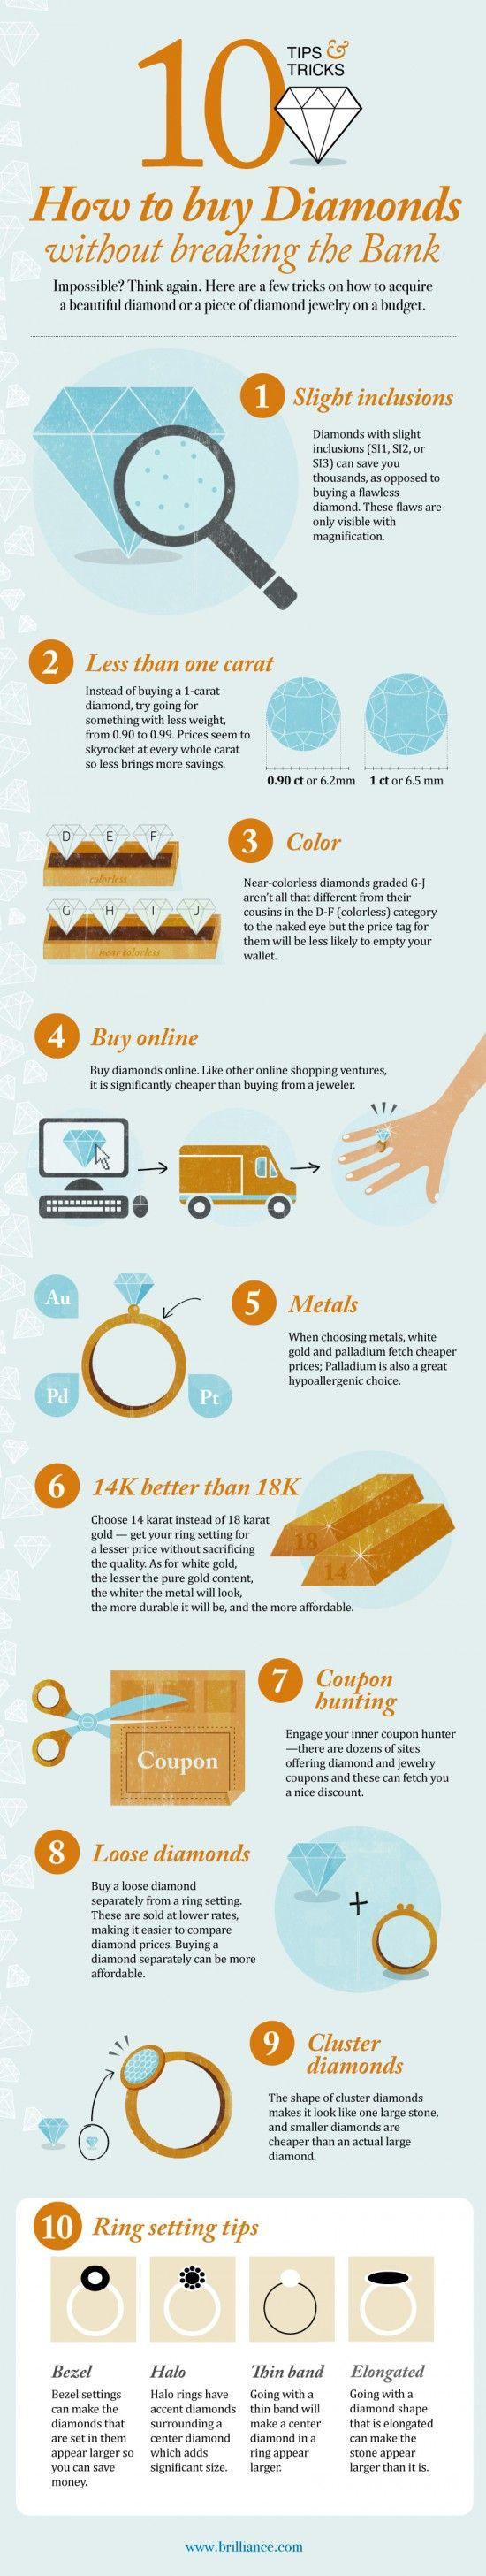 How to buy DiamondsDiamond Rings, 10 Diamonds, Saving Money, Tops 10, How To Buy A Diamonds Rings, Buy Diamonds, Tips And Tricks, Diamonds Buy Guide, Diamonds Infographic